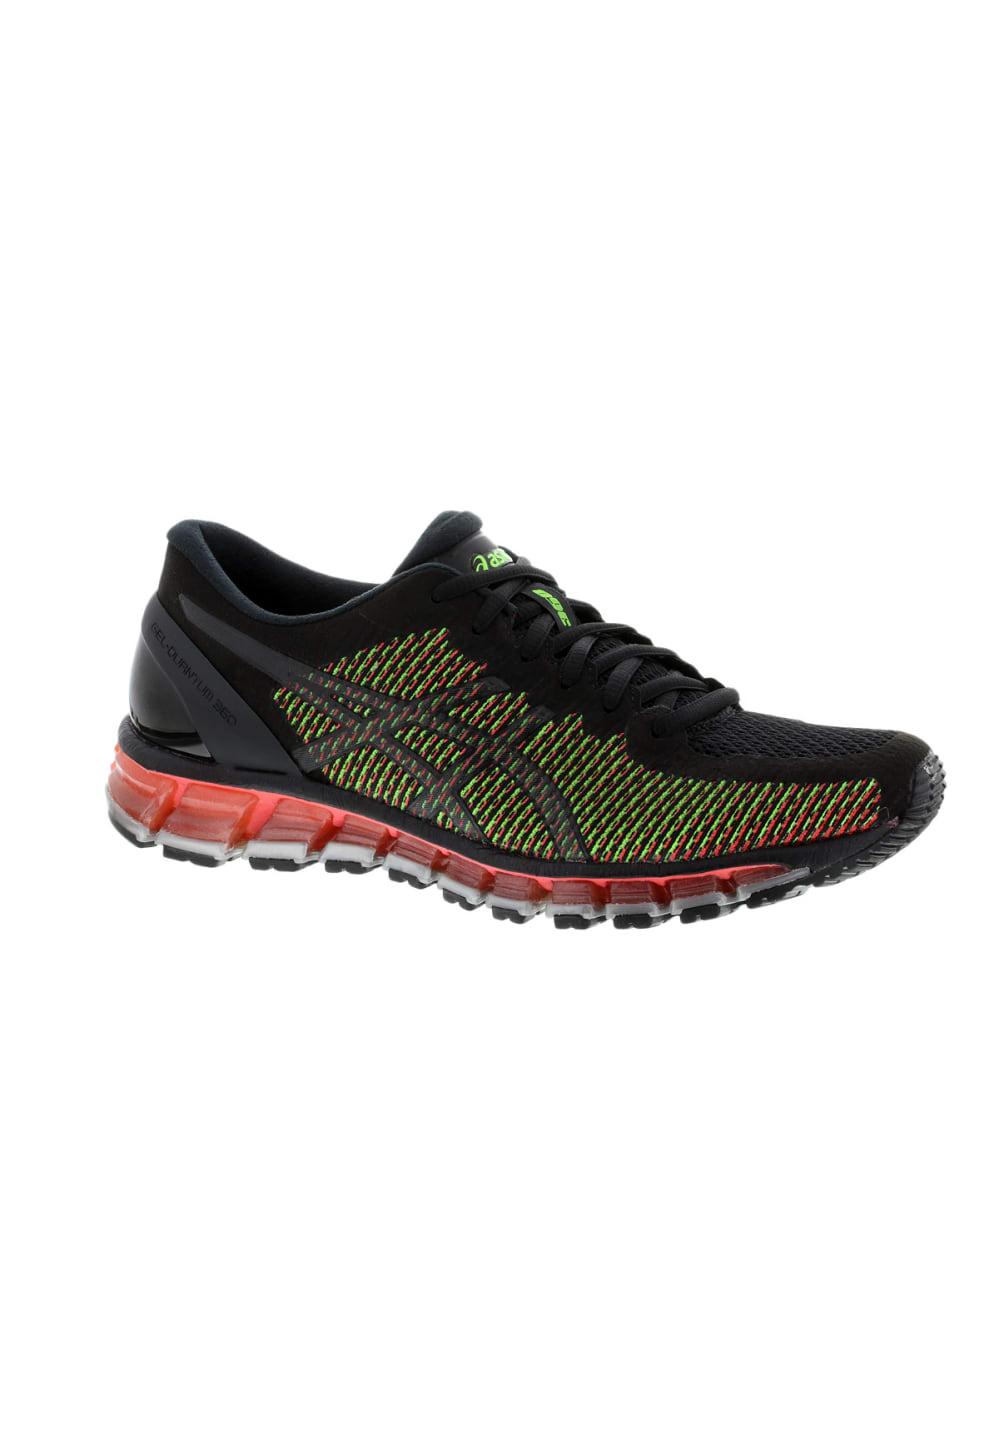 Chaussures Asics Quantum Pour Noir Running Femme Gel 360 Cm TwOkXPZiu